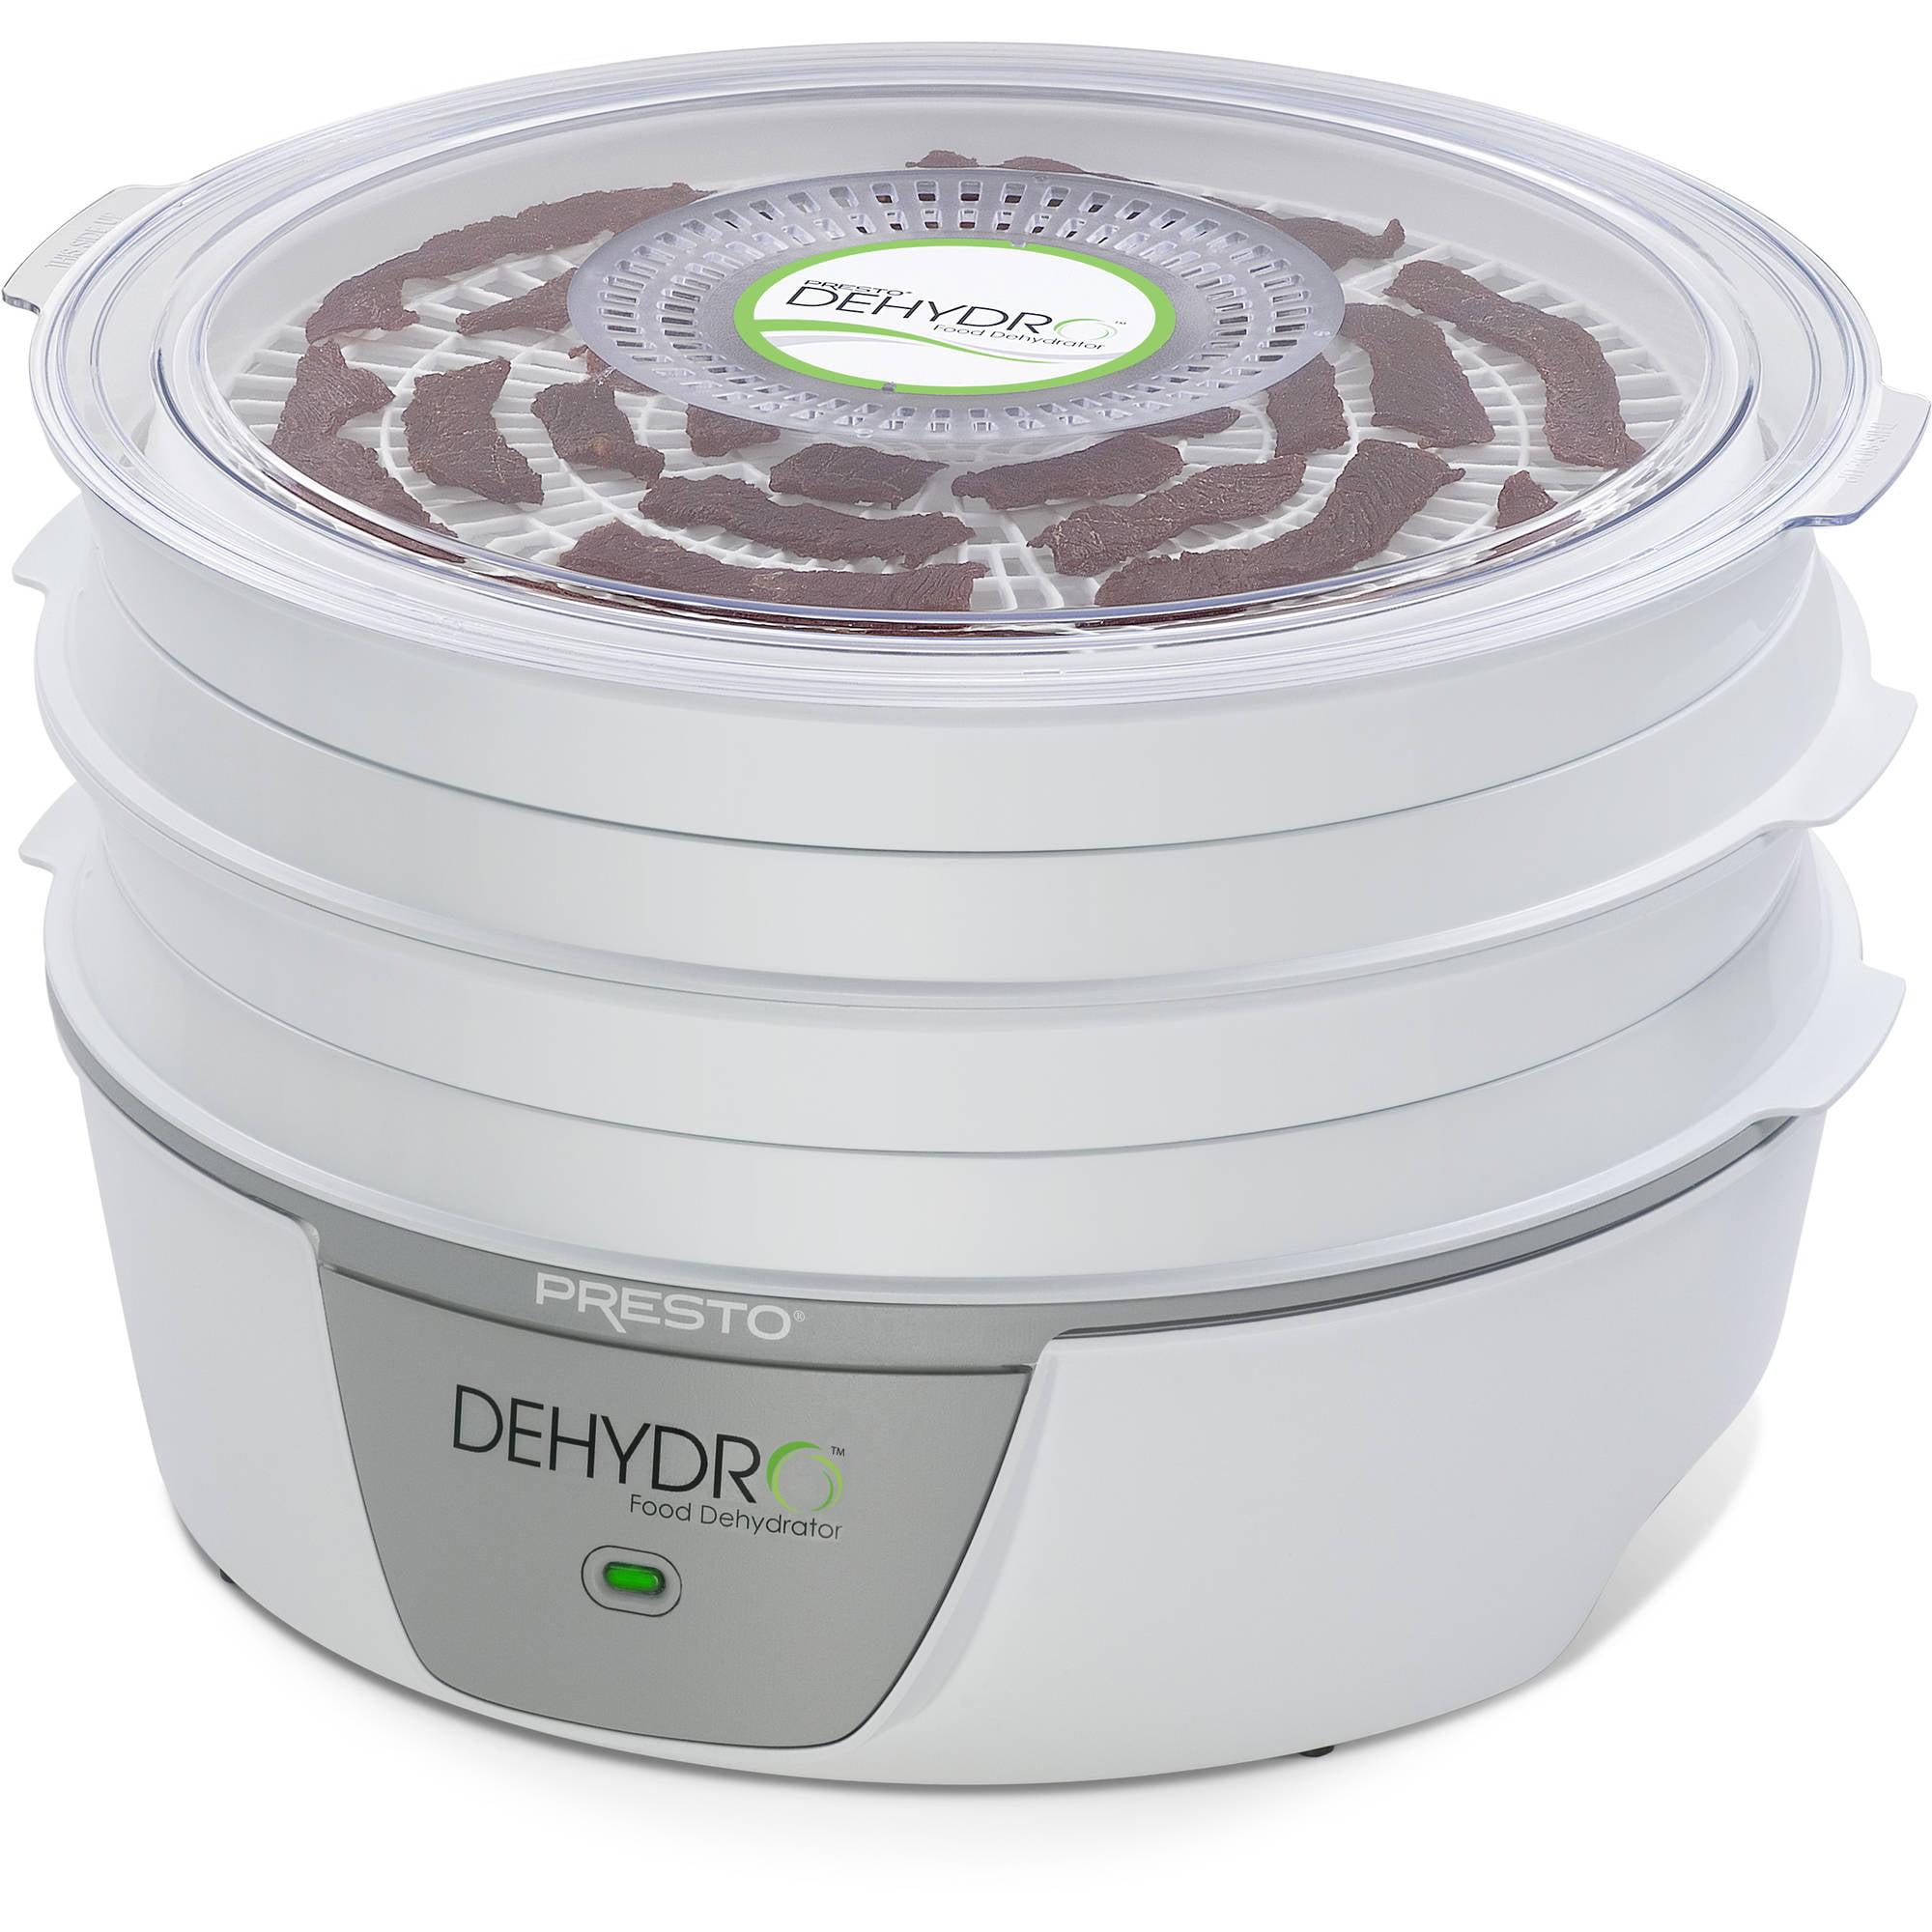 Presto Dehydro Electric Food Dehydrator 06300 Walmart Com